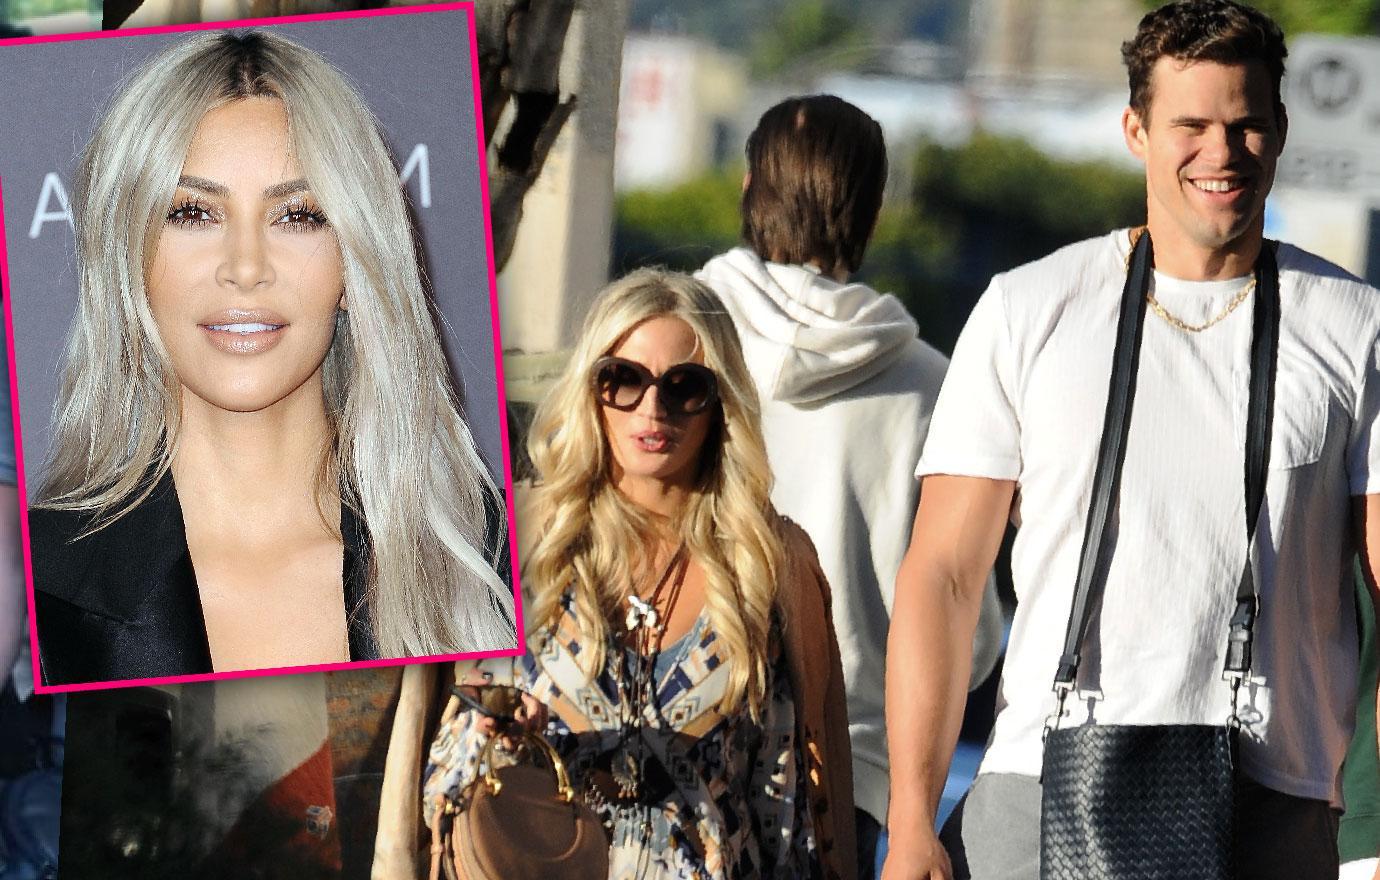 Kim Kardashian Ex Kris Humphries Spotted With Lookalike